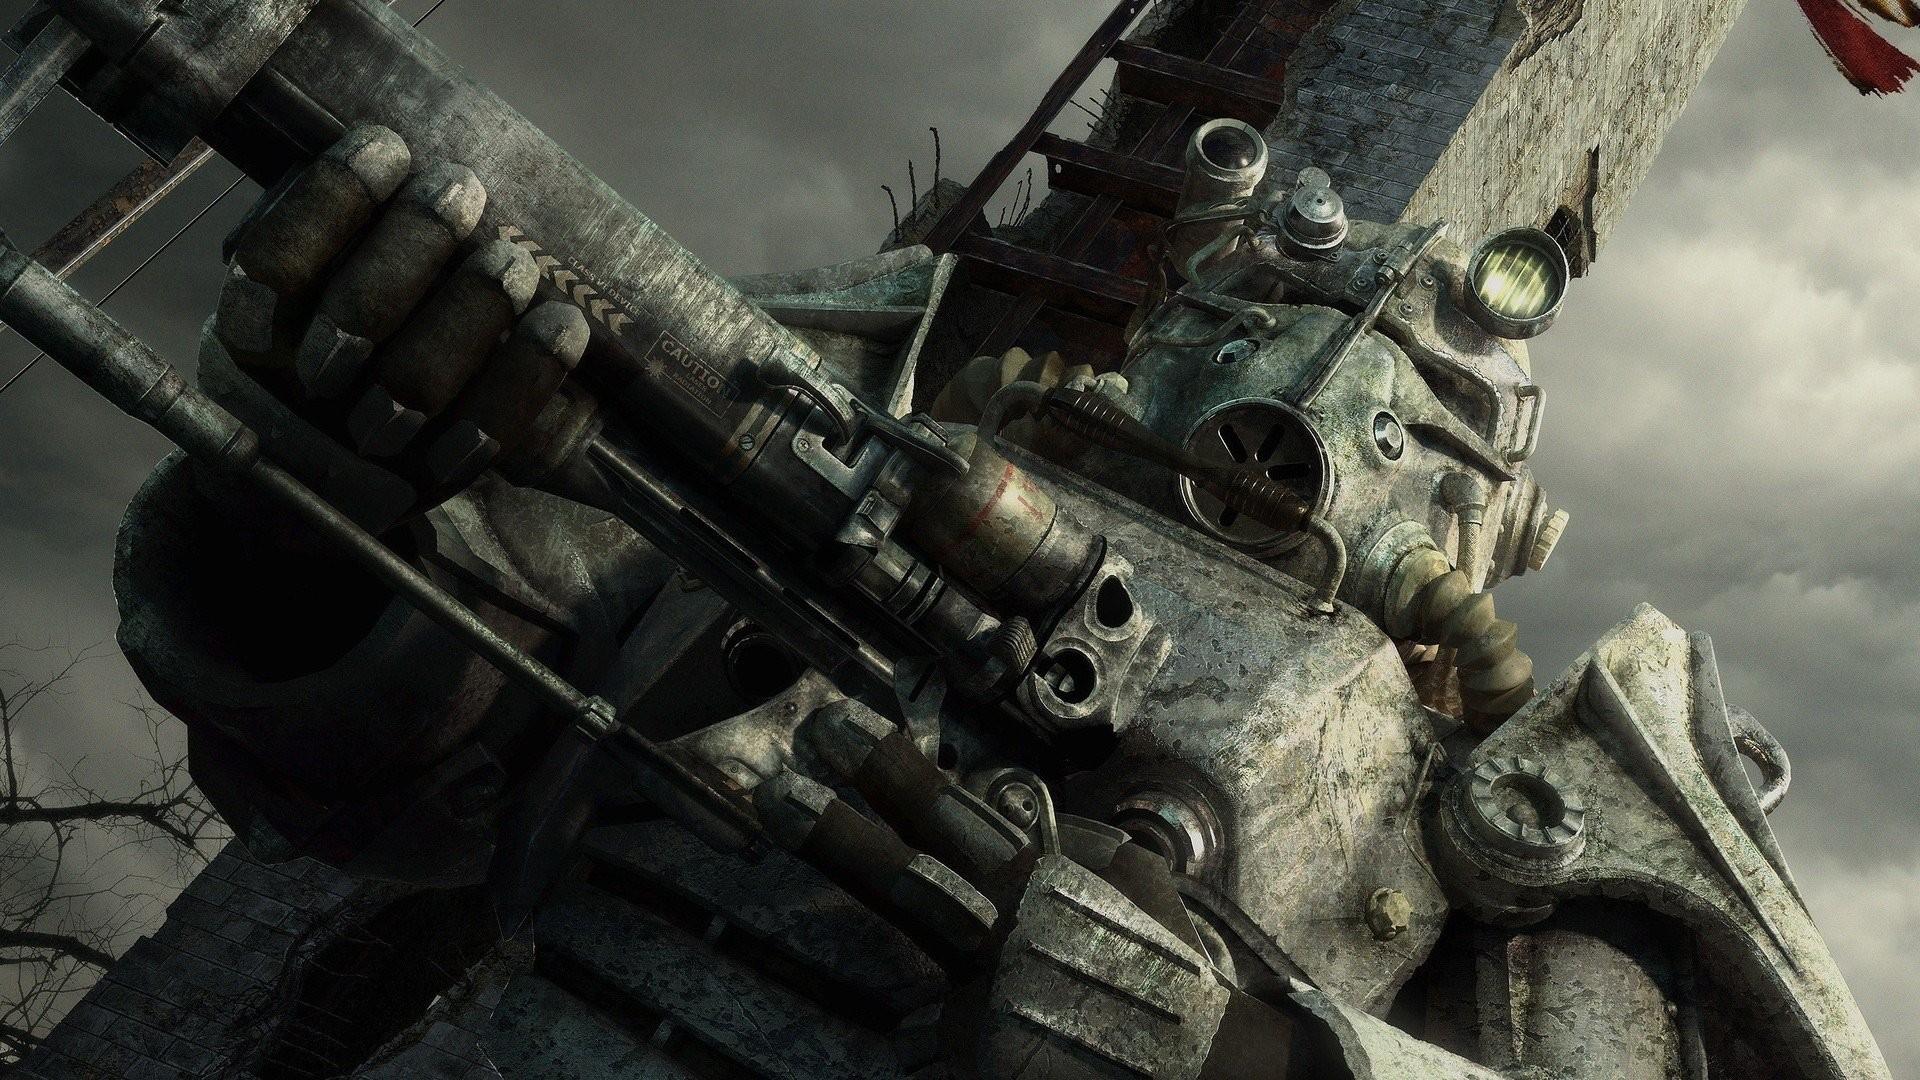 Video games Fallout CGI Brotherhood Of Steel Fallout 3 washington monument  wallpaper | | 307981 | WallpaperUP